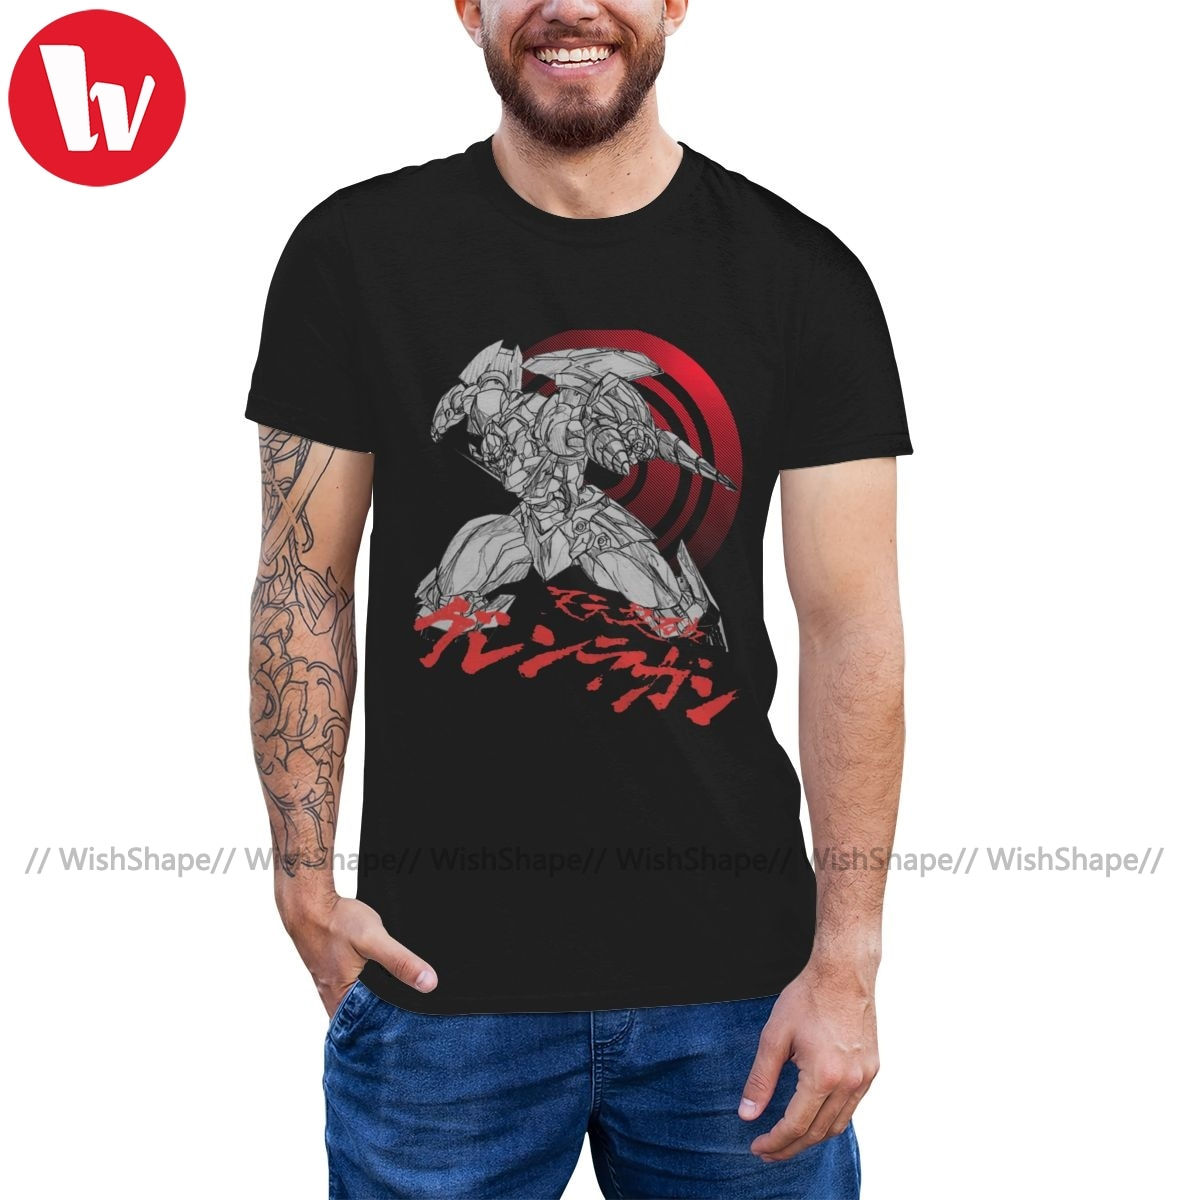 Camiseta Gurren Lagann, camiseta Gurren-Lagann, camiseta gráfica bonita, camiseta de manga corta de talla grande de verano para hombres